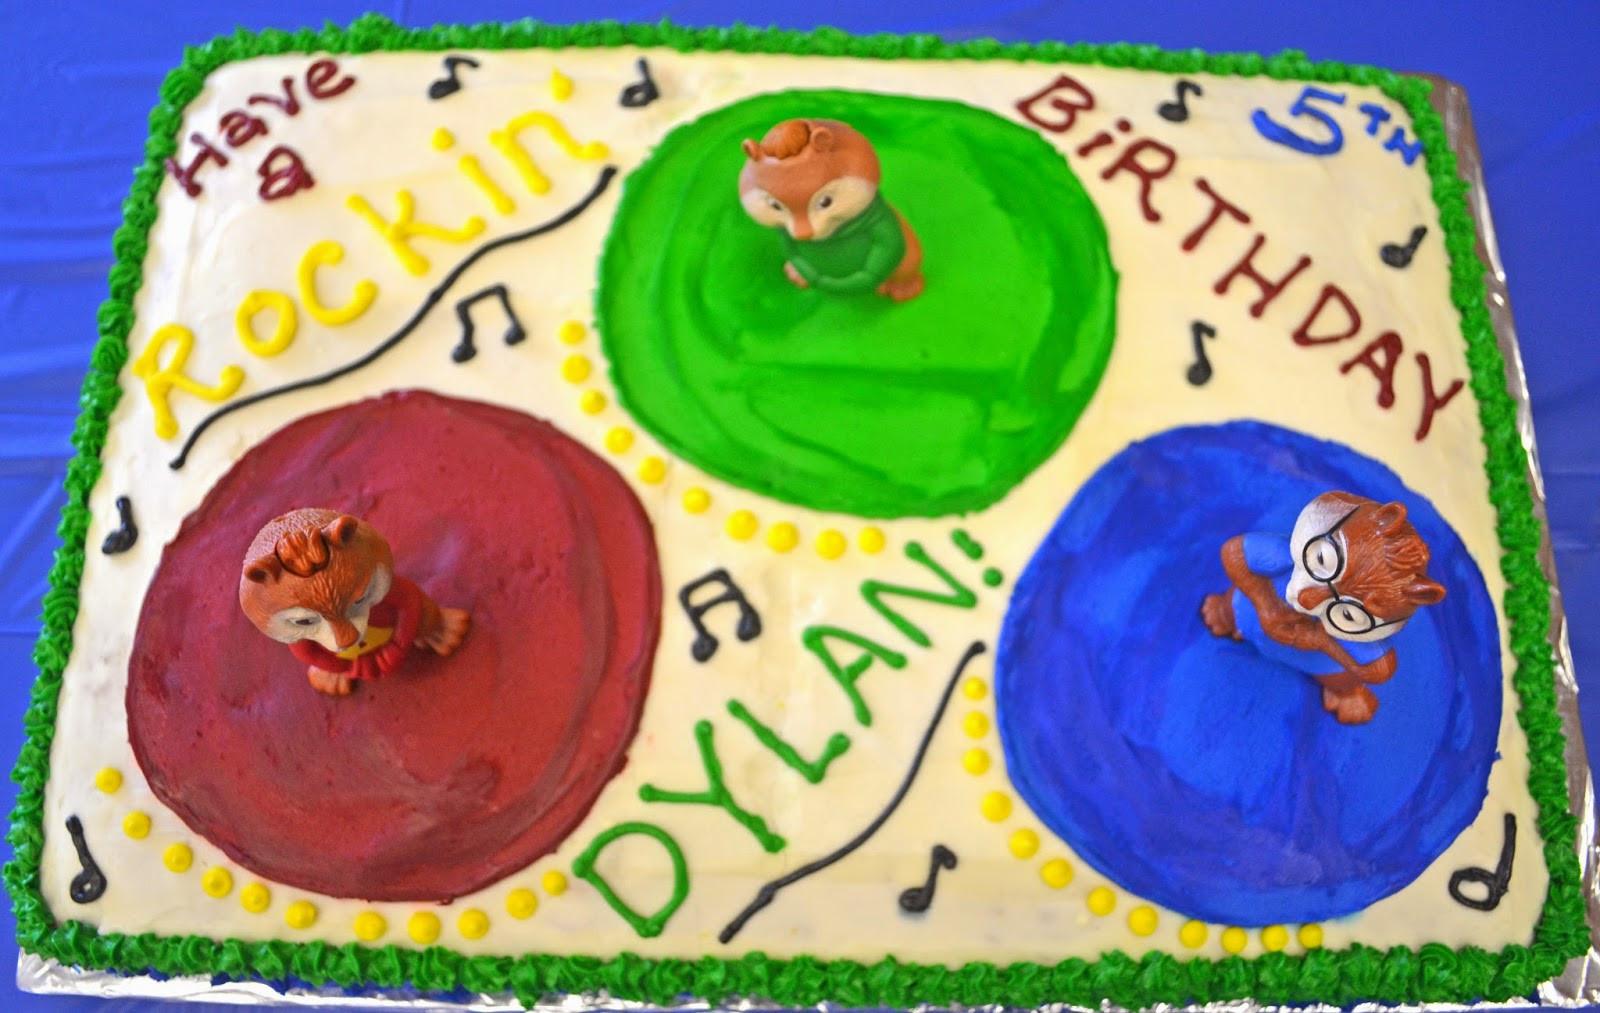 Alvin And The Chipmunks Birthday Cake  Affordable Cakes by Tiffany Alvin and the Chipmunks Cake